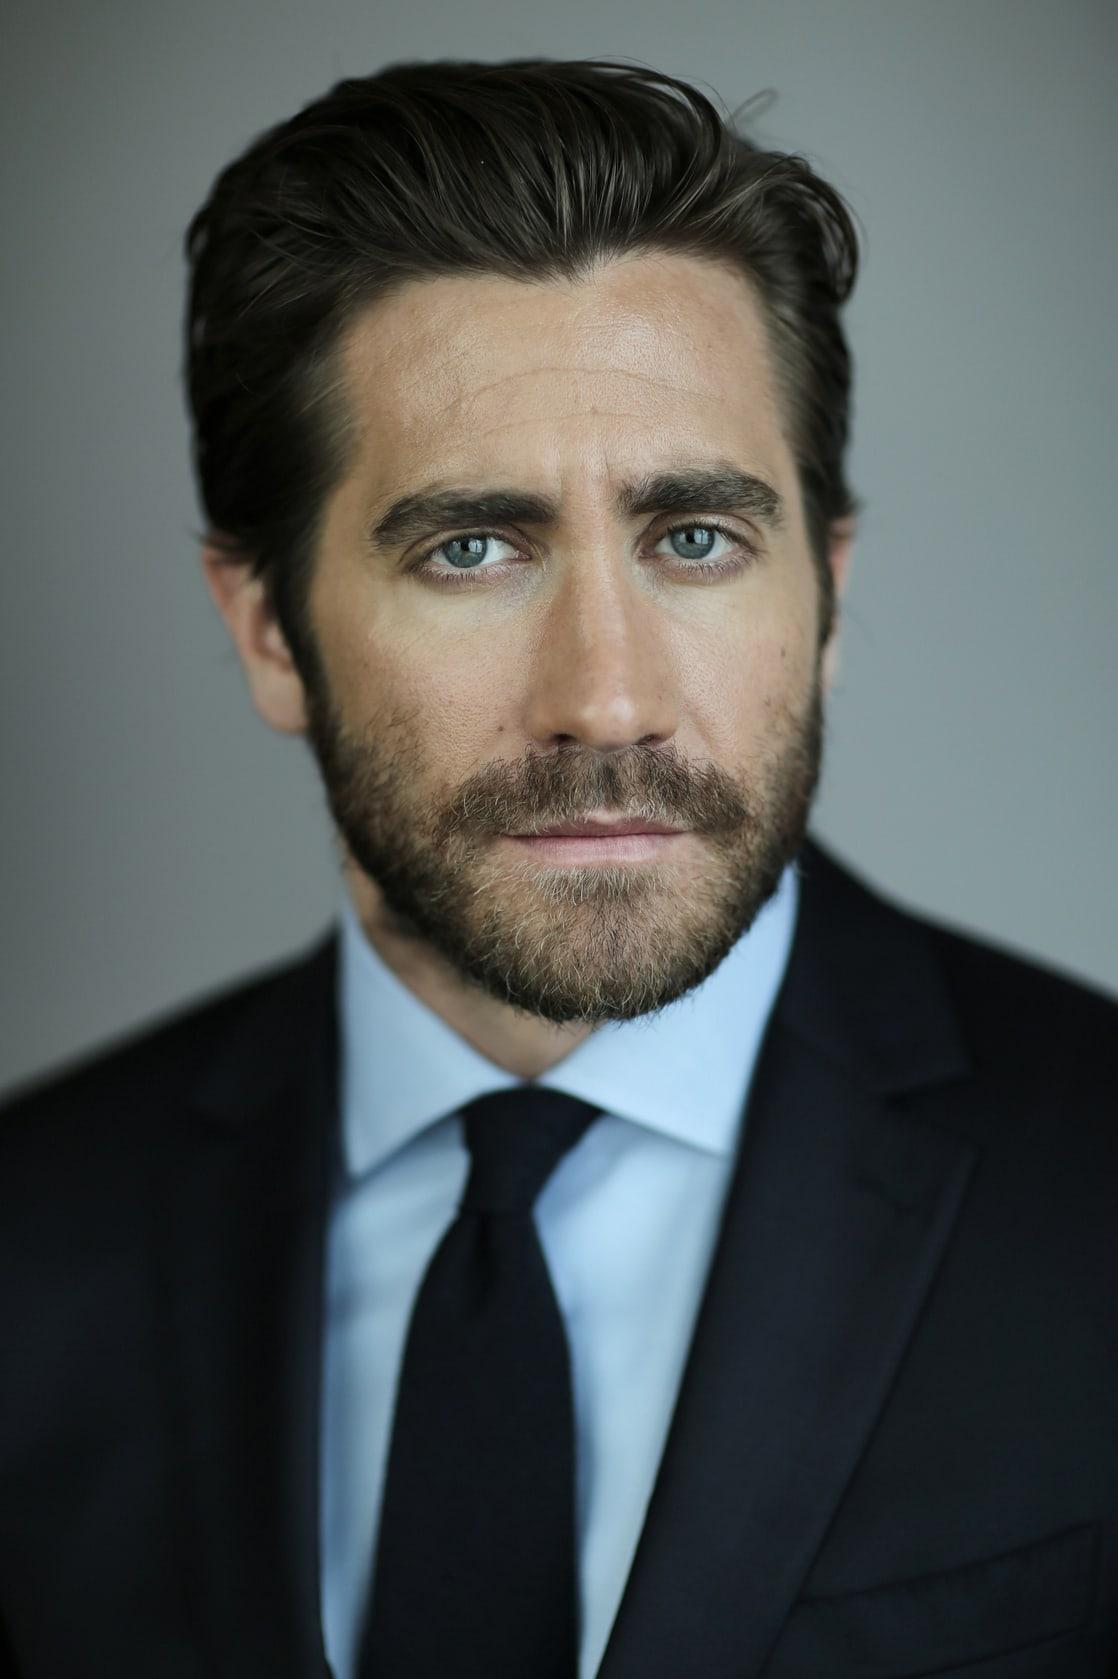 Picture of Jake Gyllen... Jake Gyllenhaal